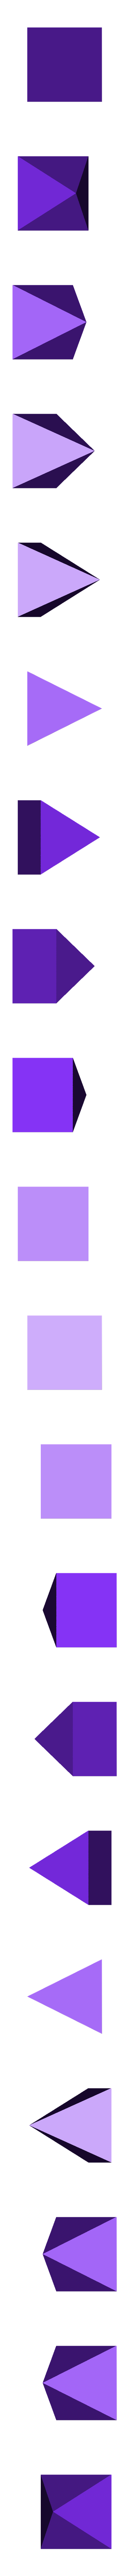 pyramid.stl Download free STL file geometric shapes • 3D print object, seppemachielsen